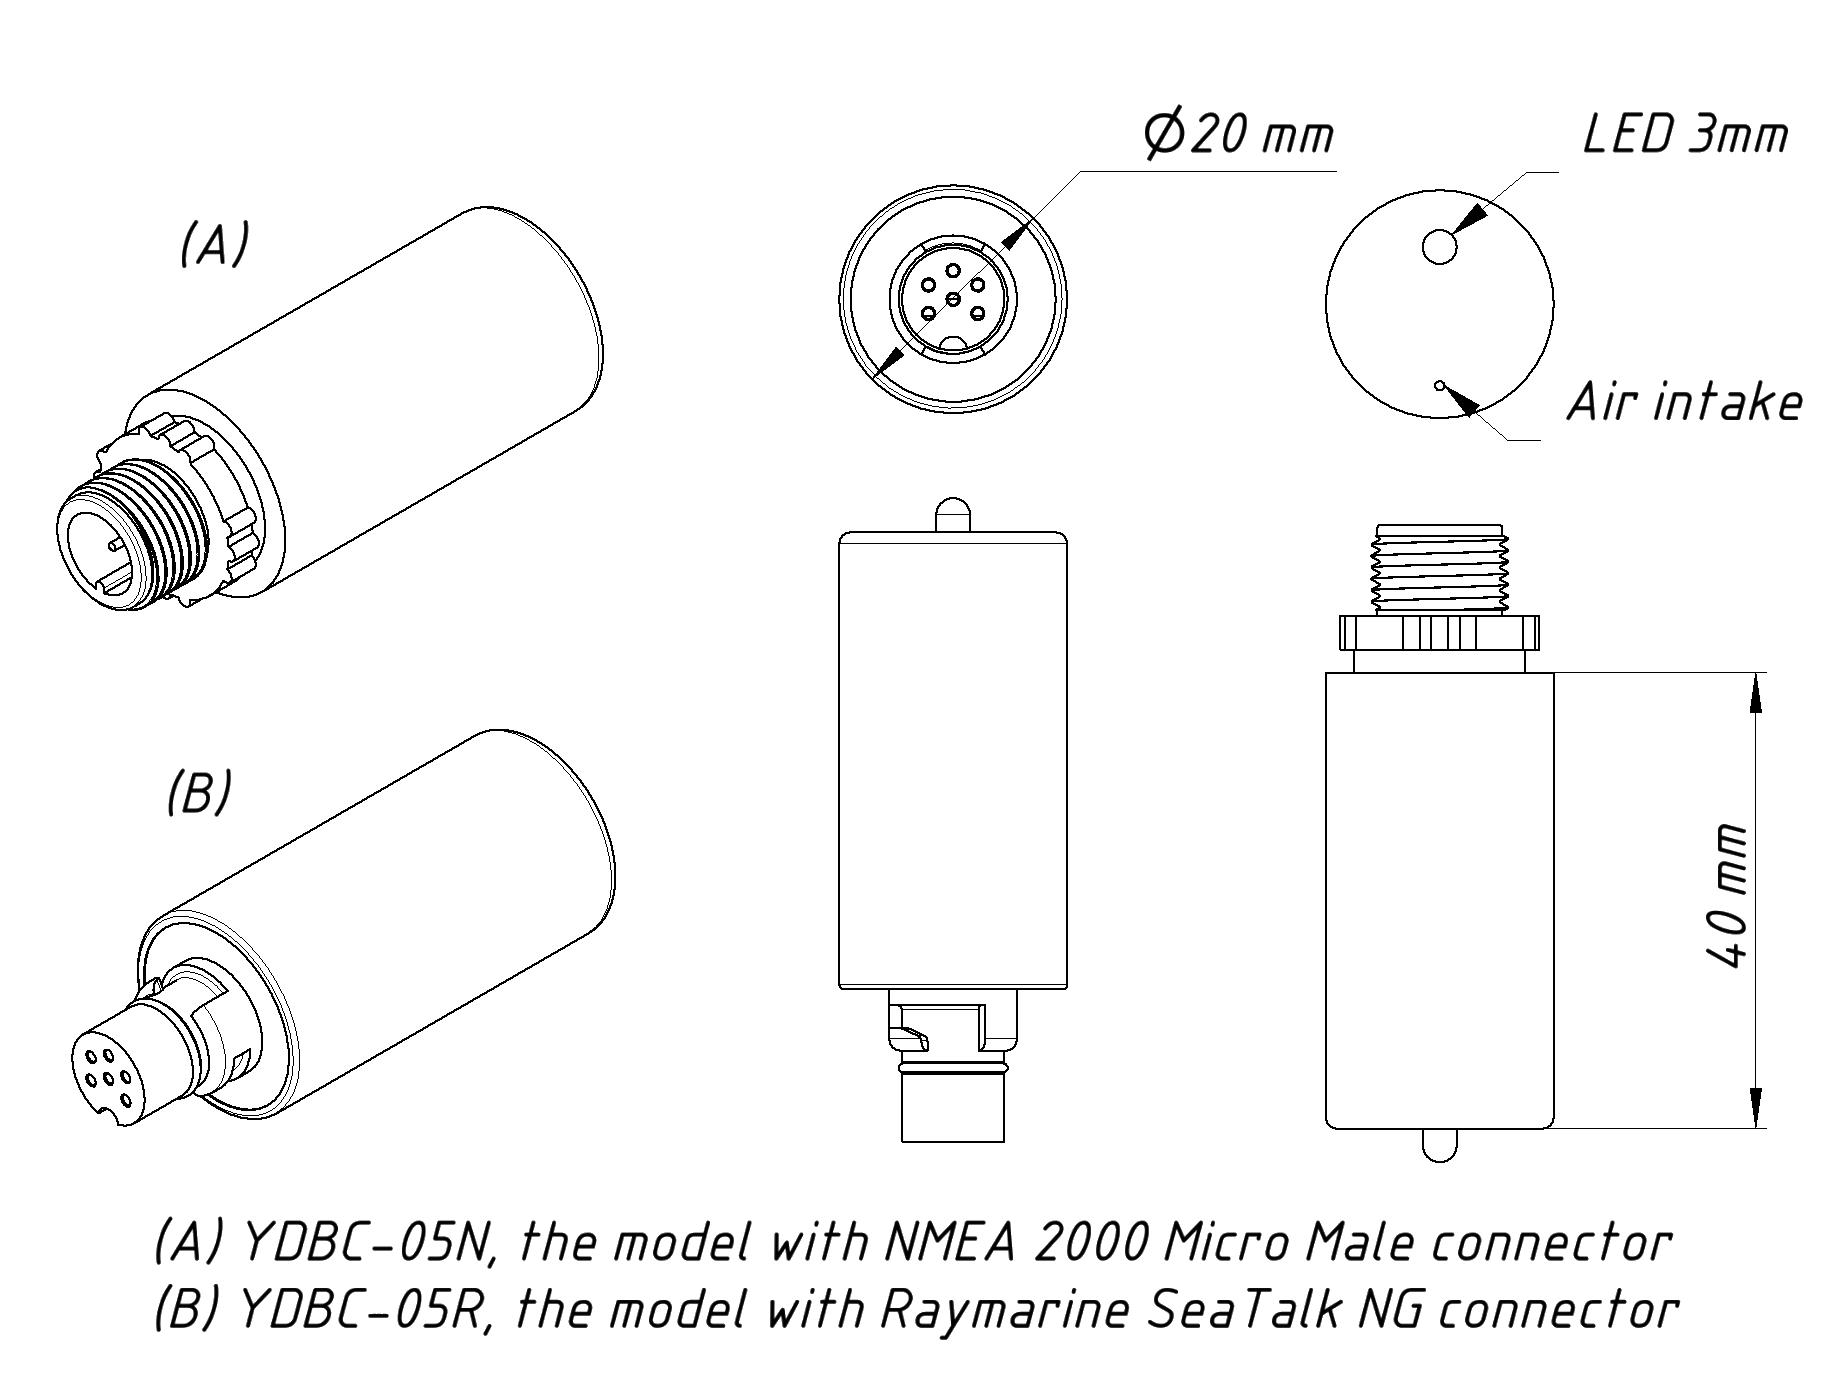 Digital Barometer For Nmea 2000 Nema Wiring Diagram Drawing Of Ydbc 05n And 05r Models